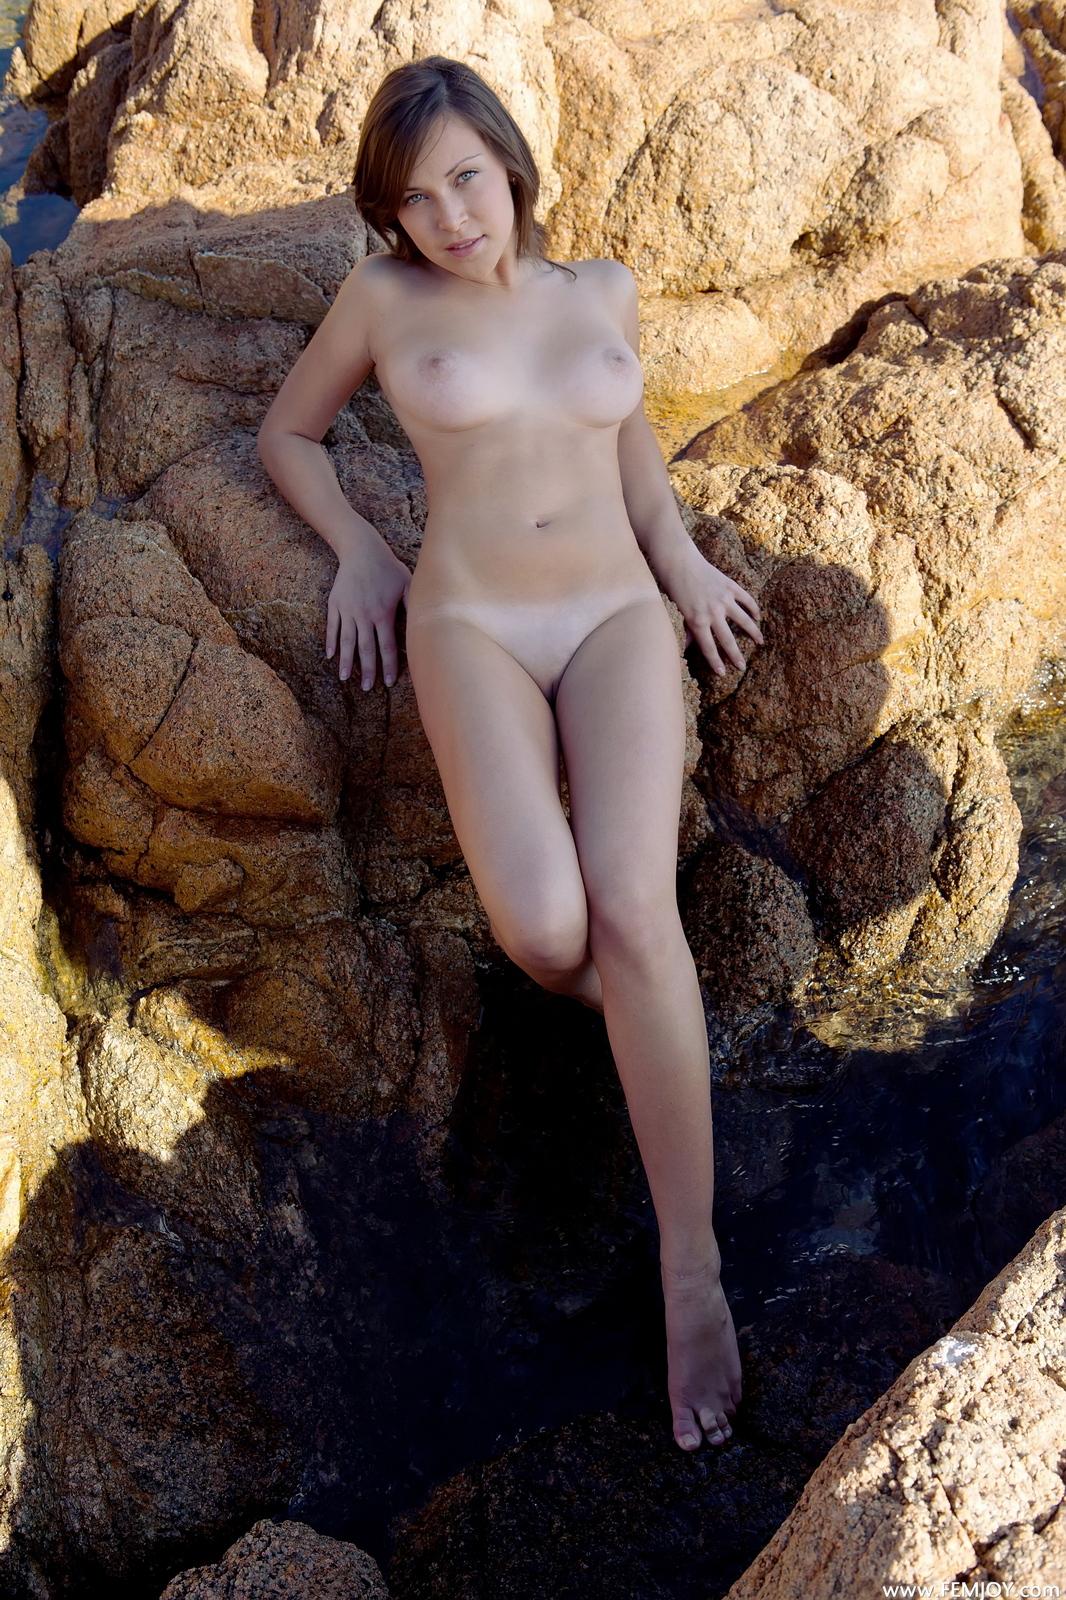 sophia-h-seaside-naked-boobs-rocks-femjoy-36